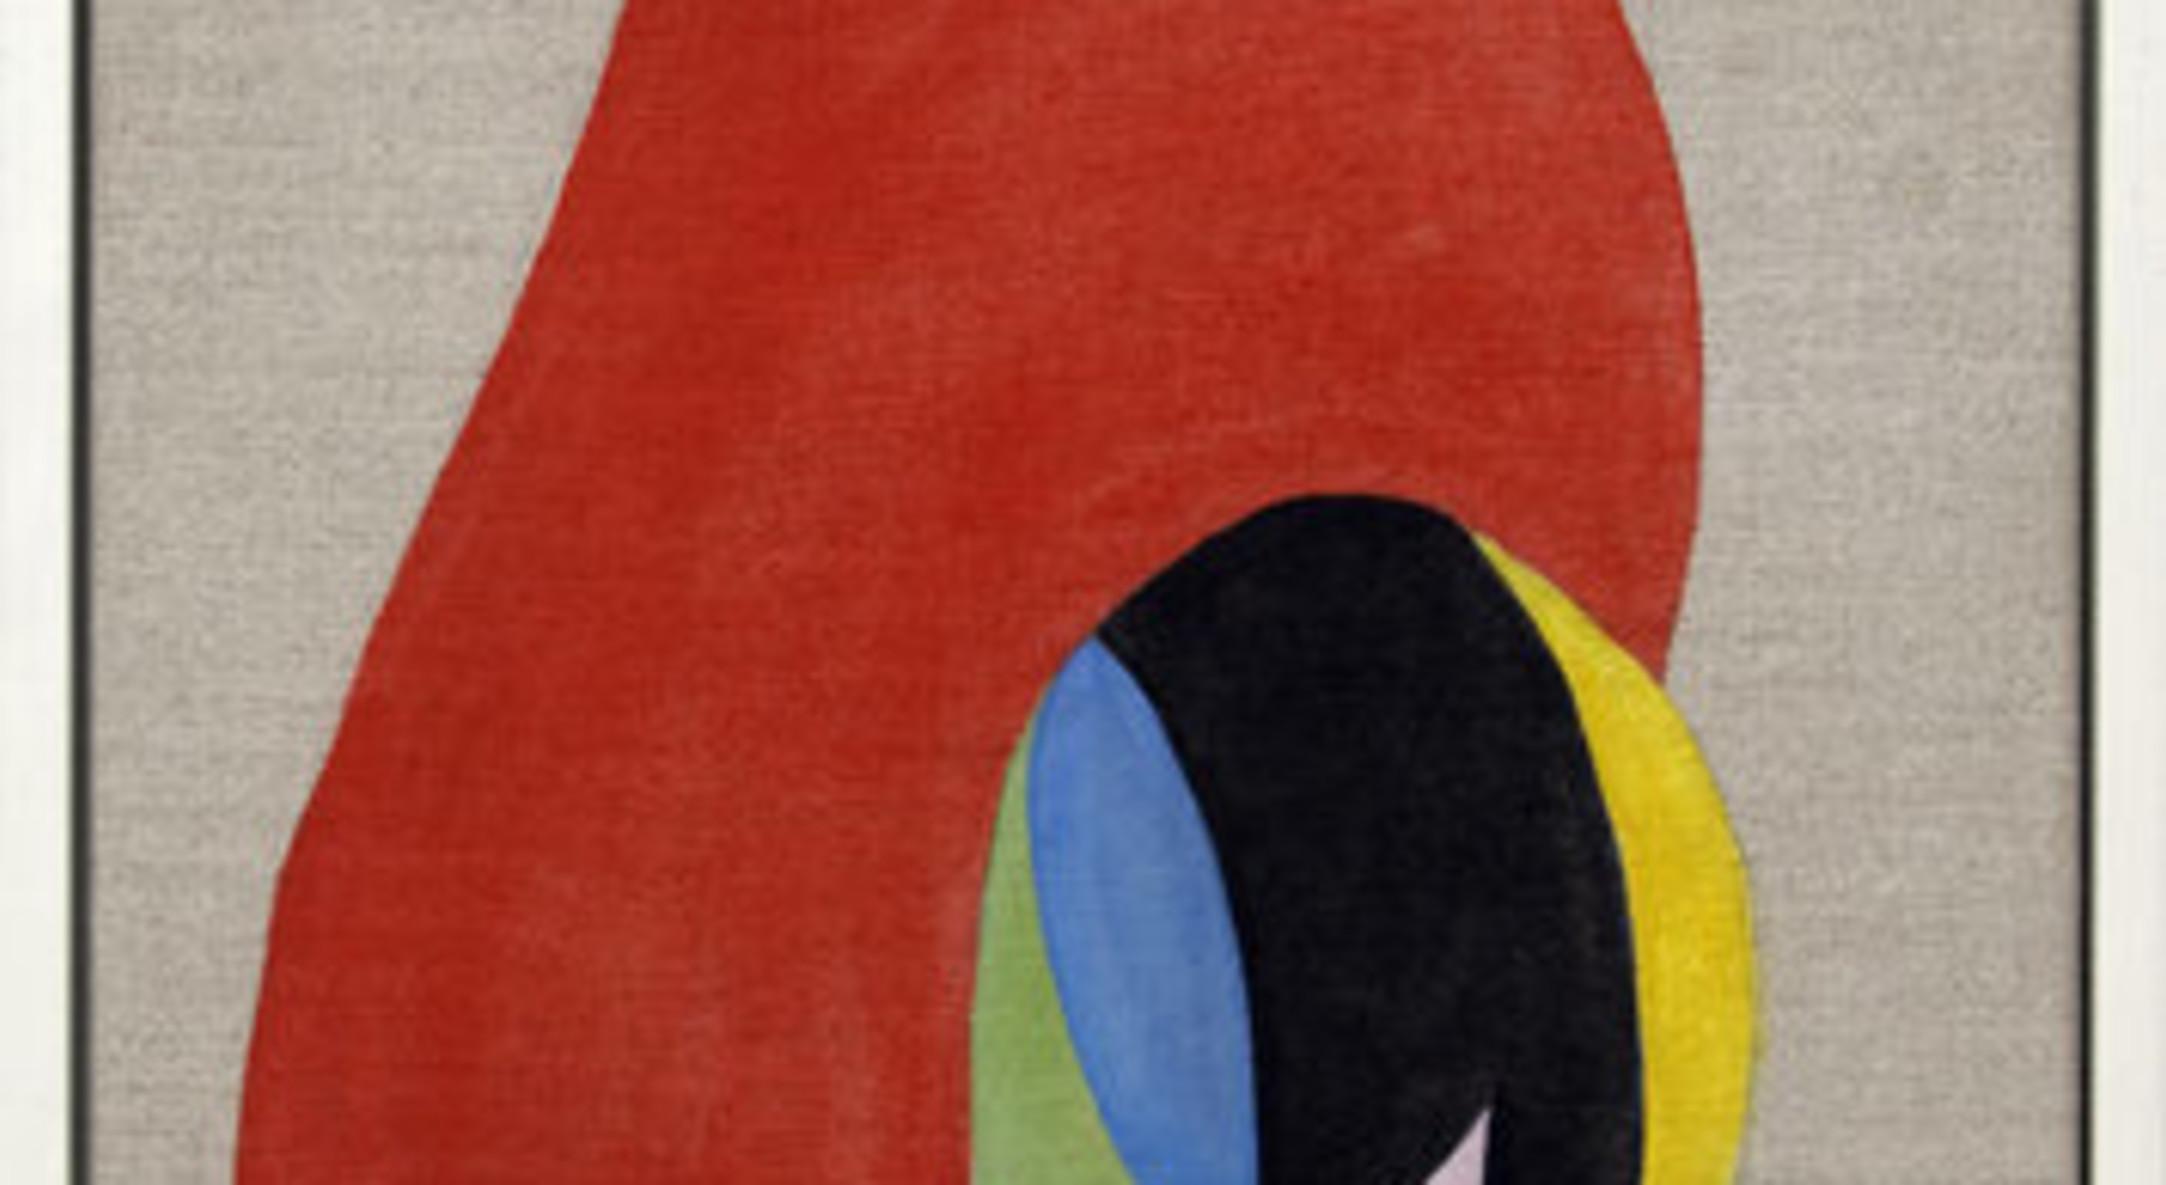 Katy Dove, Untitled (KD/M5), 2007, Oil on linen, 35 x 30 cm, 13 3/4 x 11 3/4 in